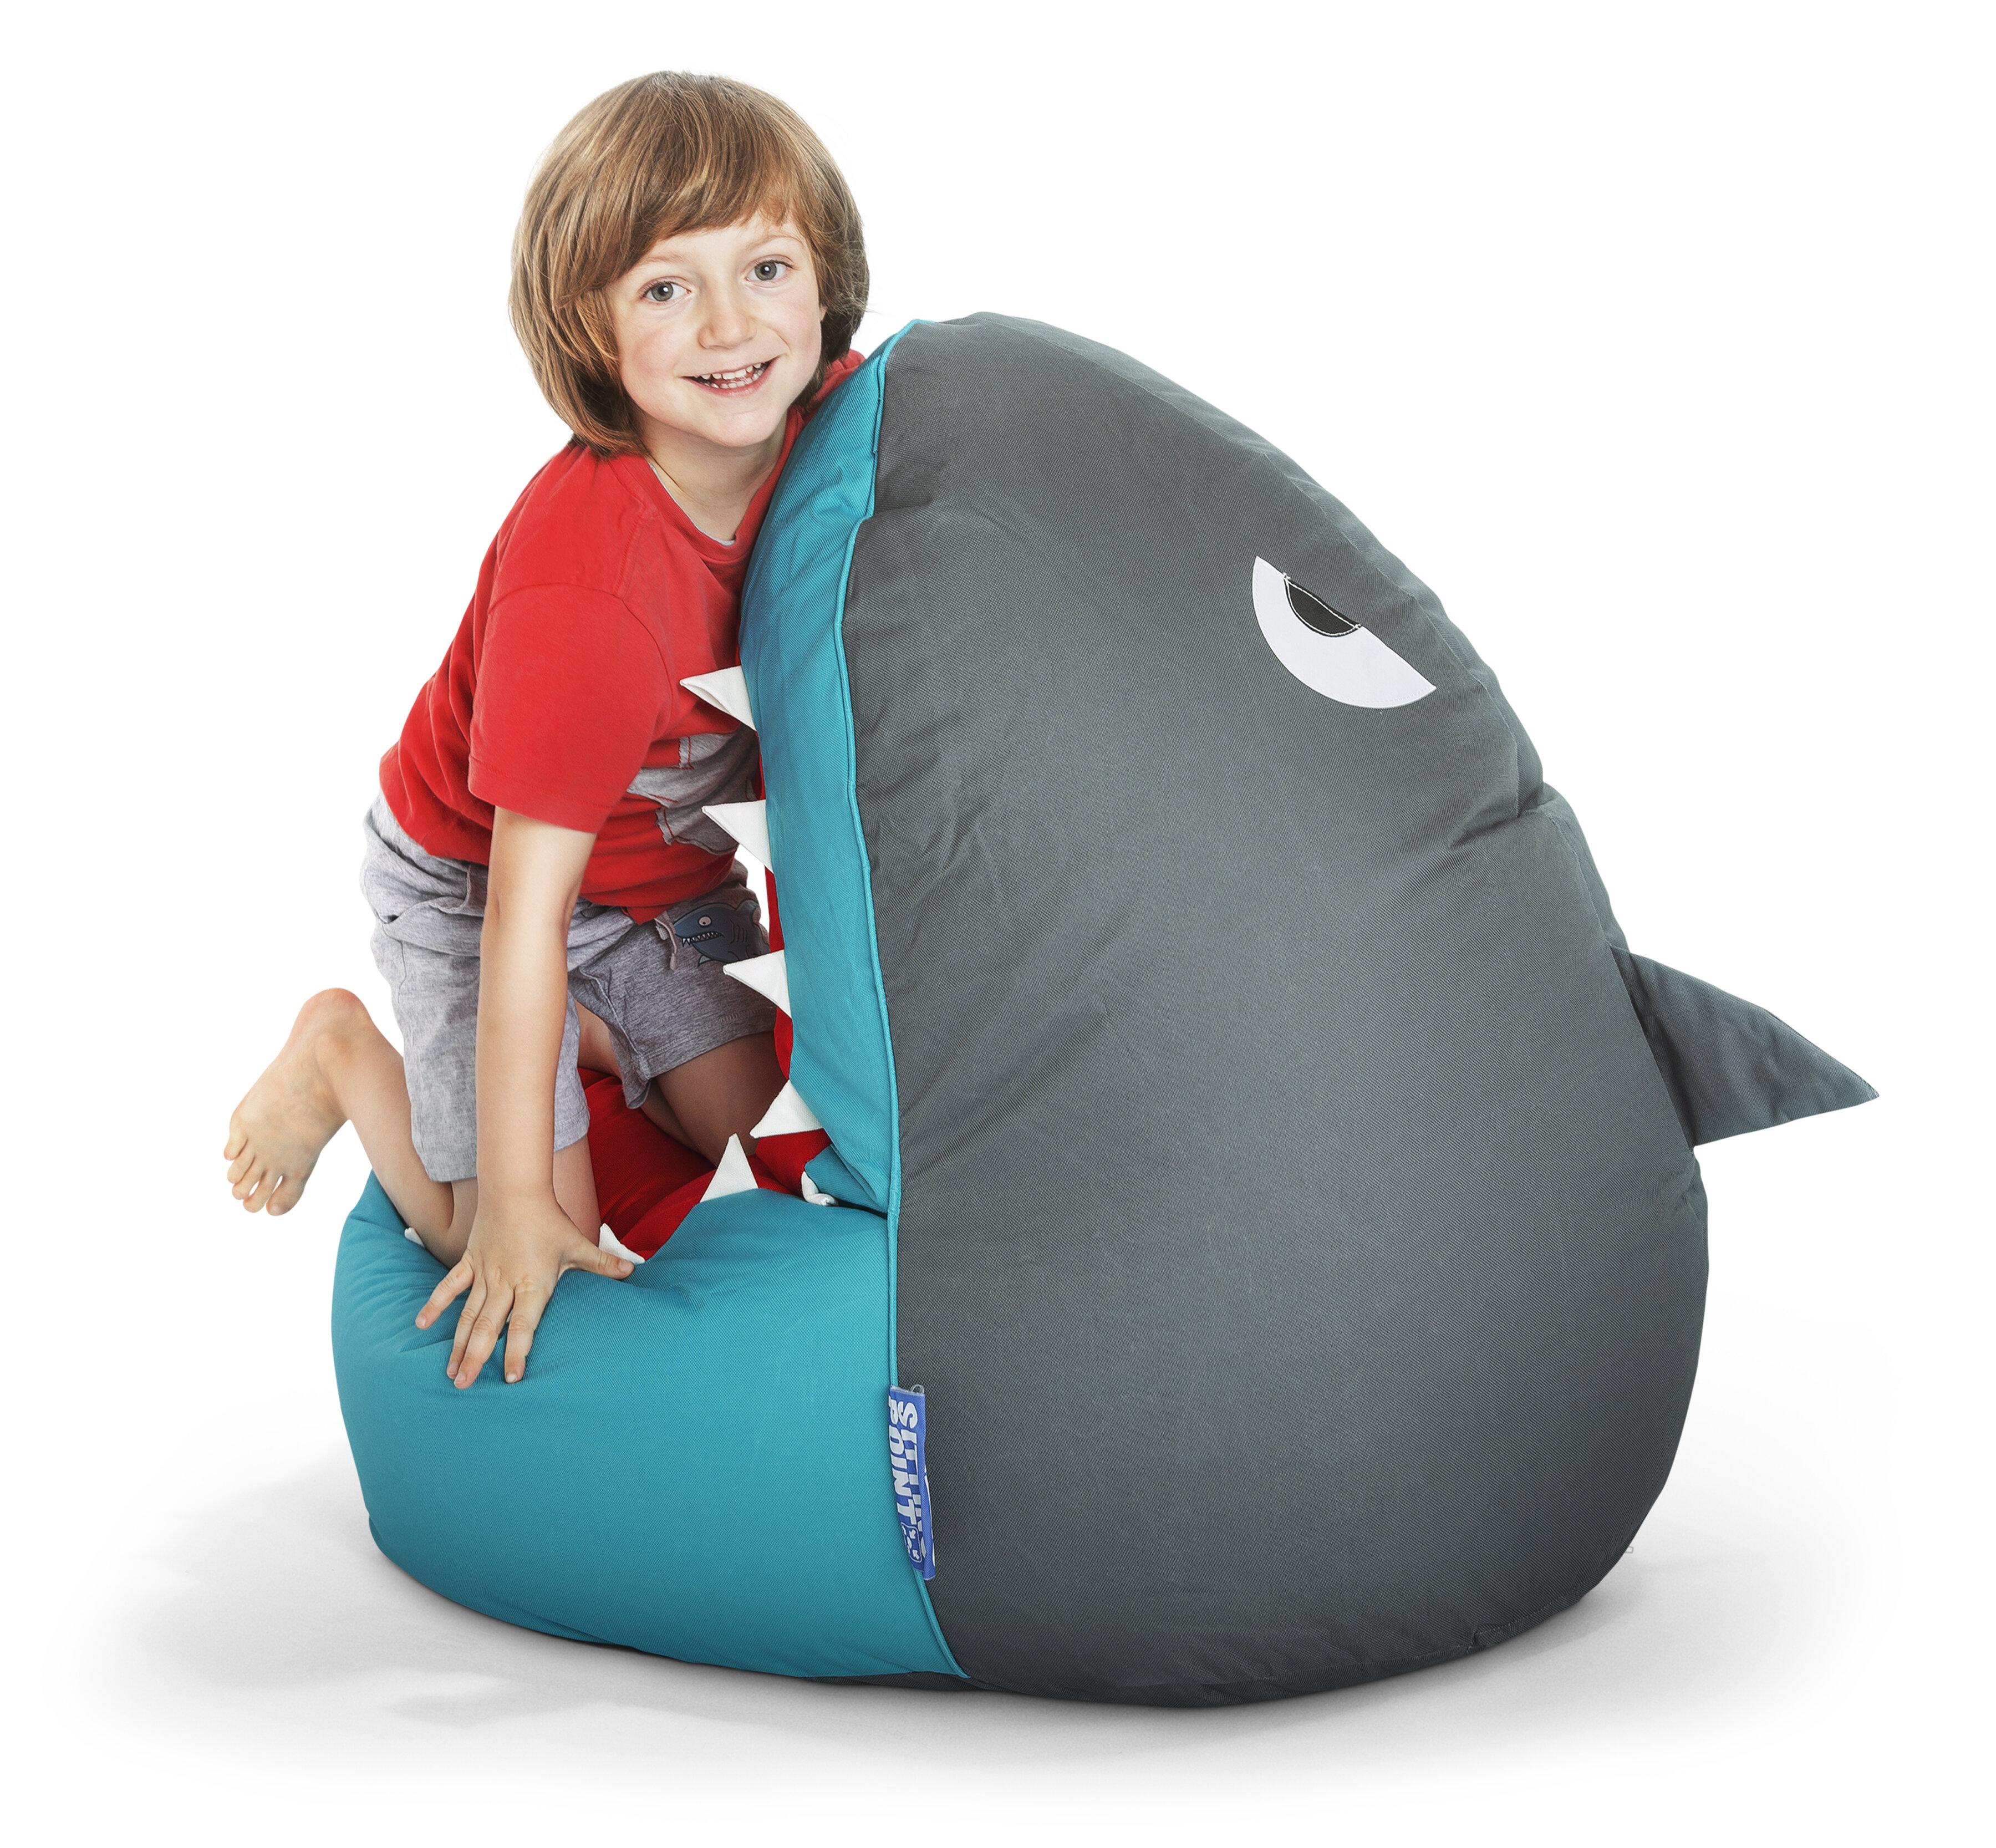 Products Stars Blue Bean Bag Chair for Dolls Ahh